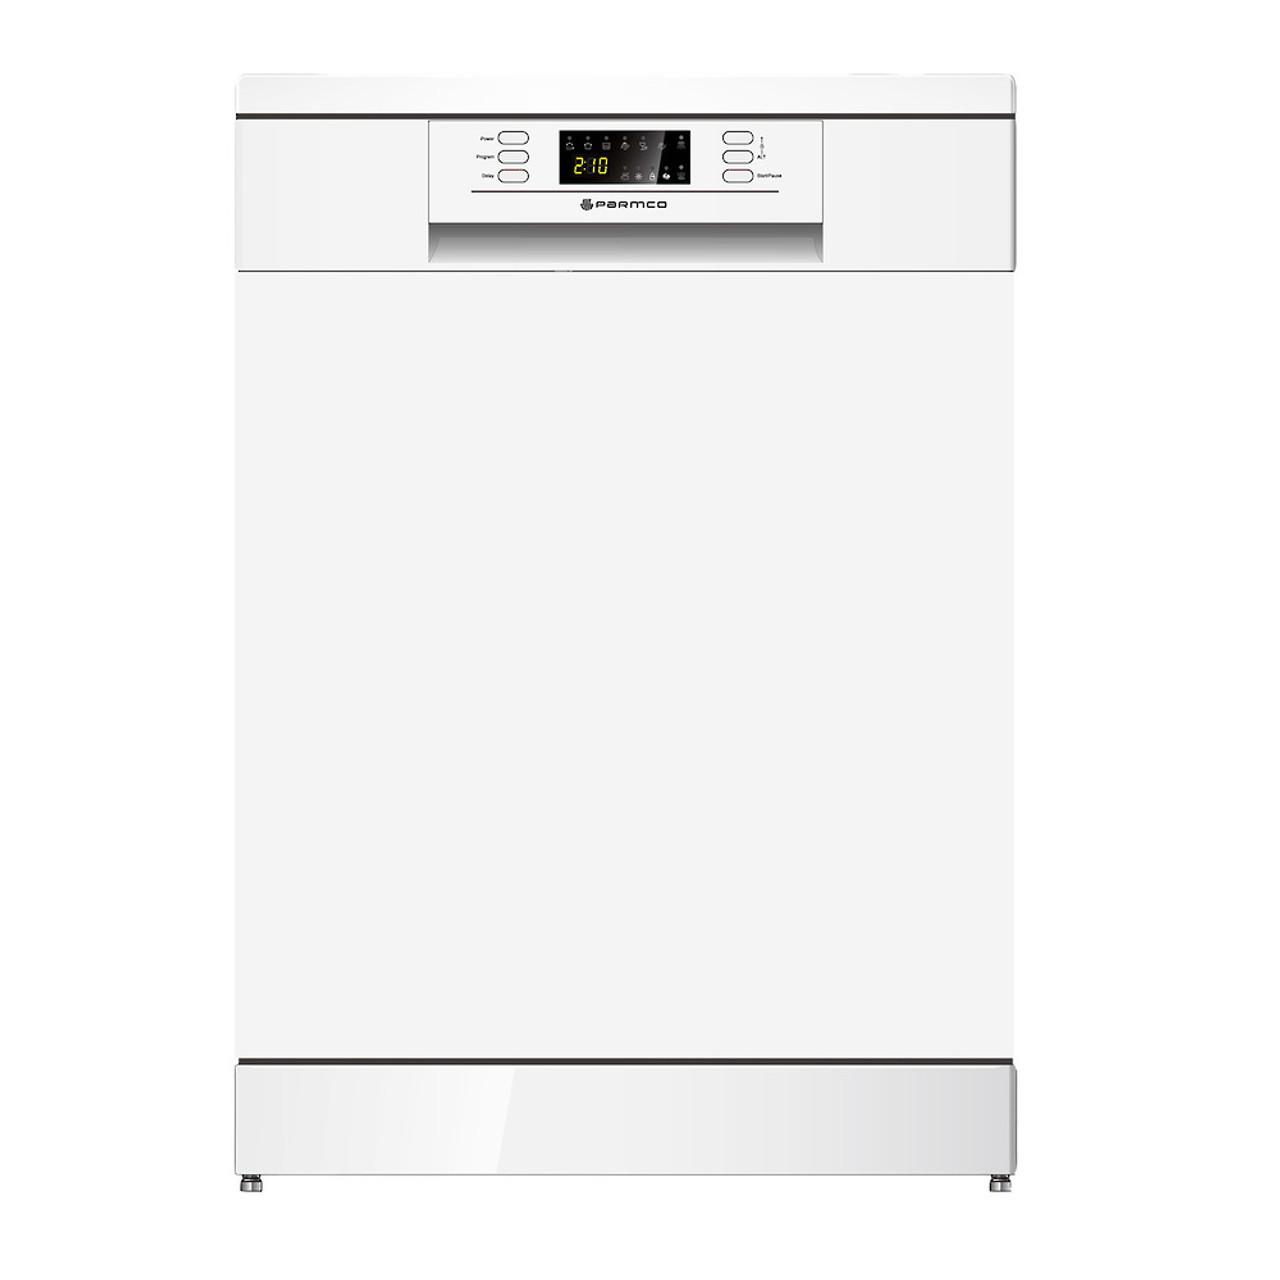 PARMCO 600mm Freestanding Dishwasher, LED Display, White